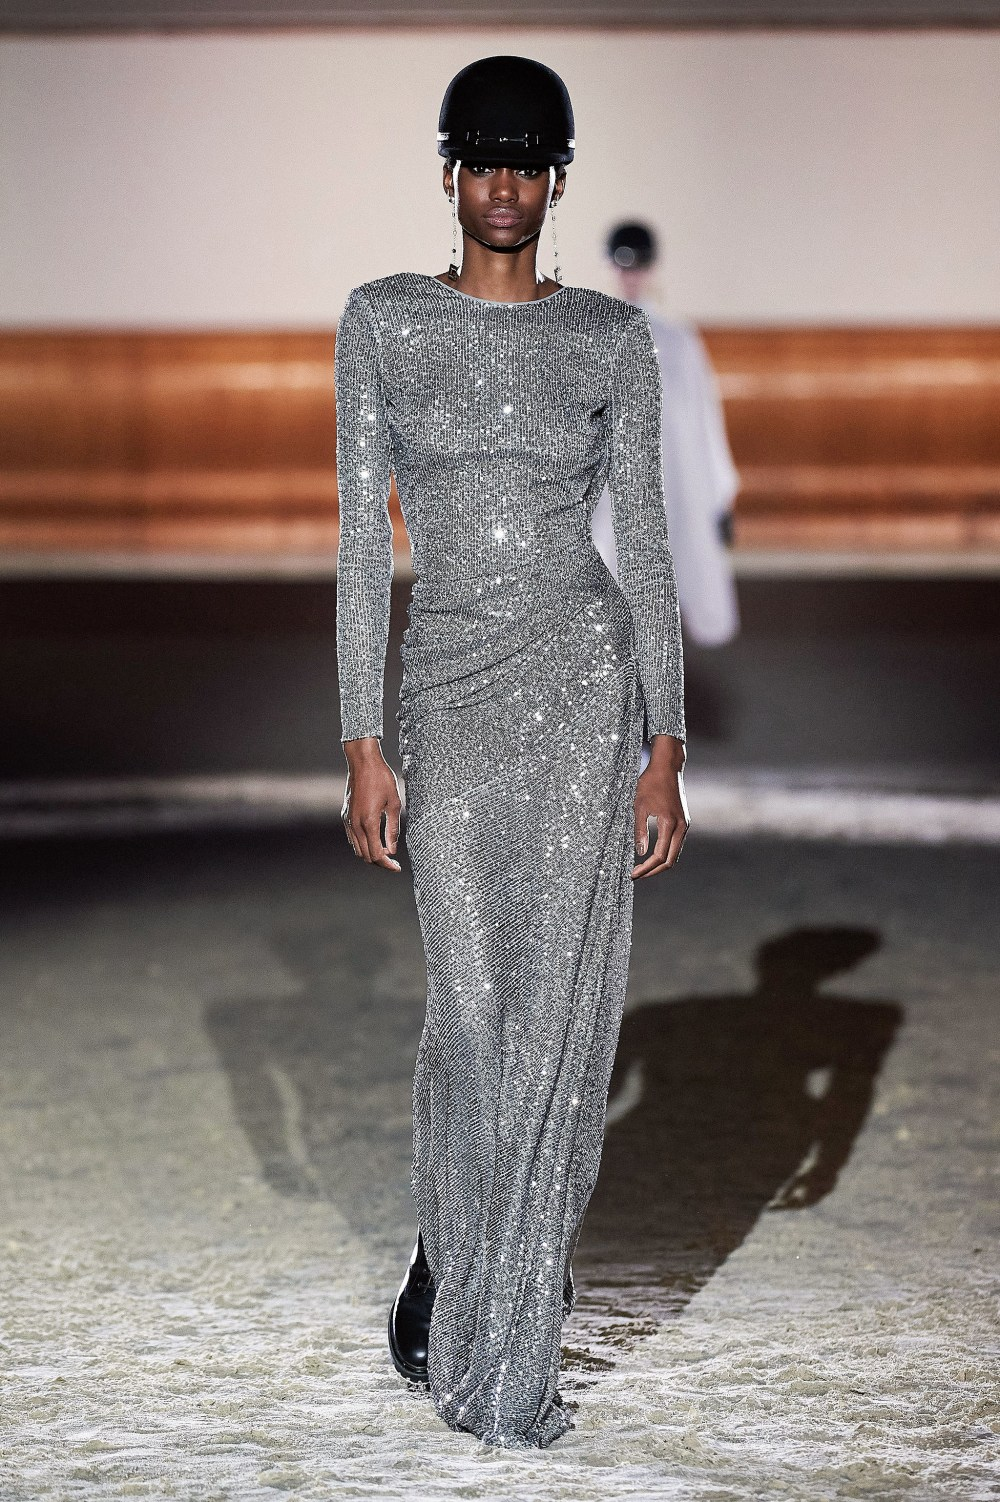 Elisabetta Franchi: Elisabetta Franchi Fall Winter 2021-22 Fashion Show Photo #27